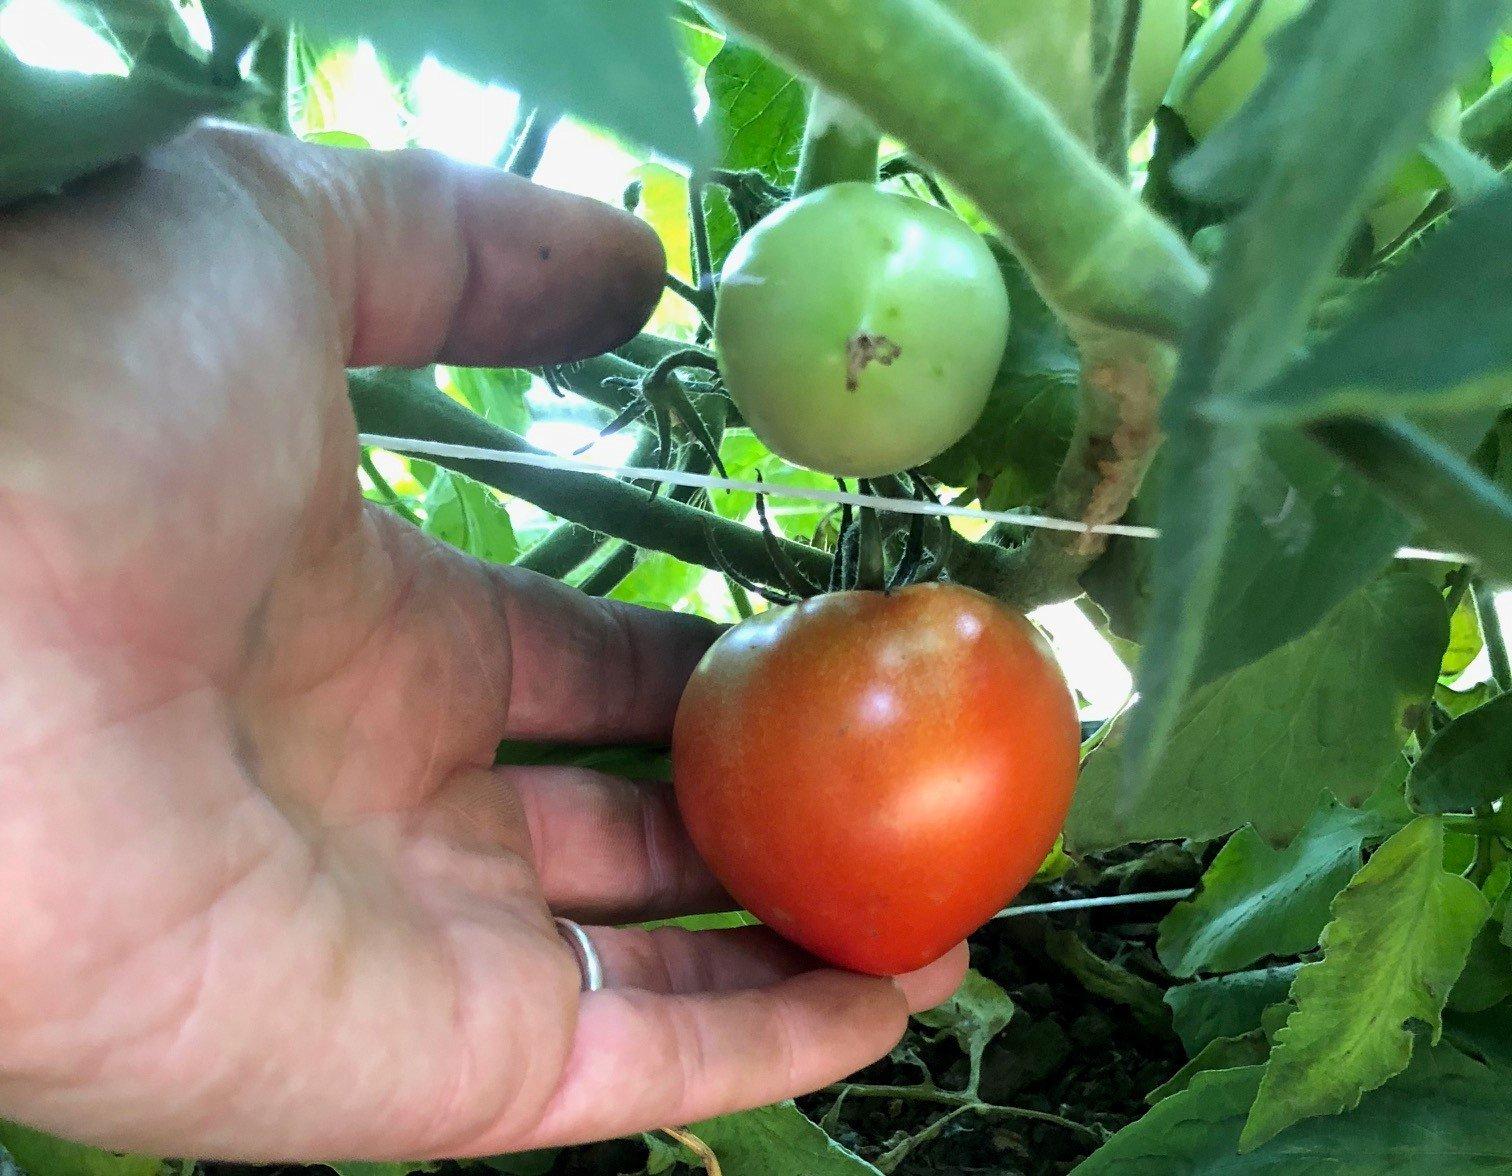 Farm Happenings for July 5, 2018: The Cool-Season/Warm-Season Transition